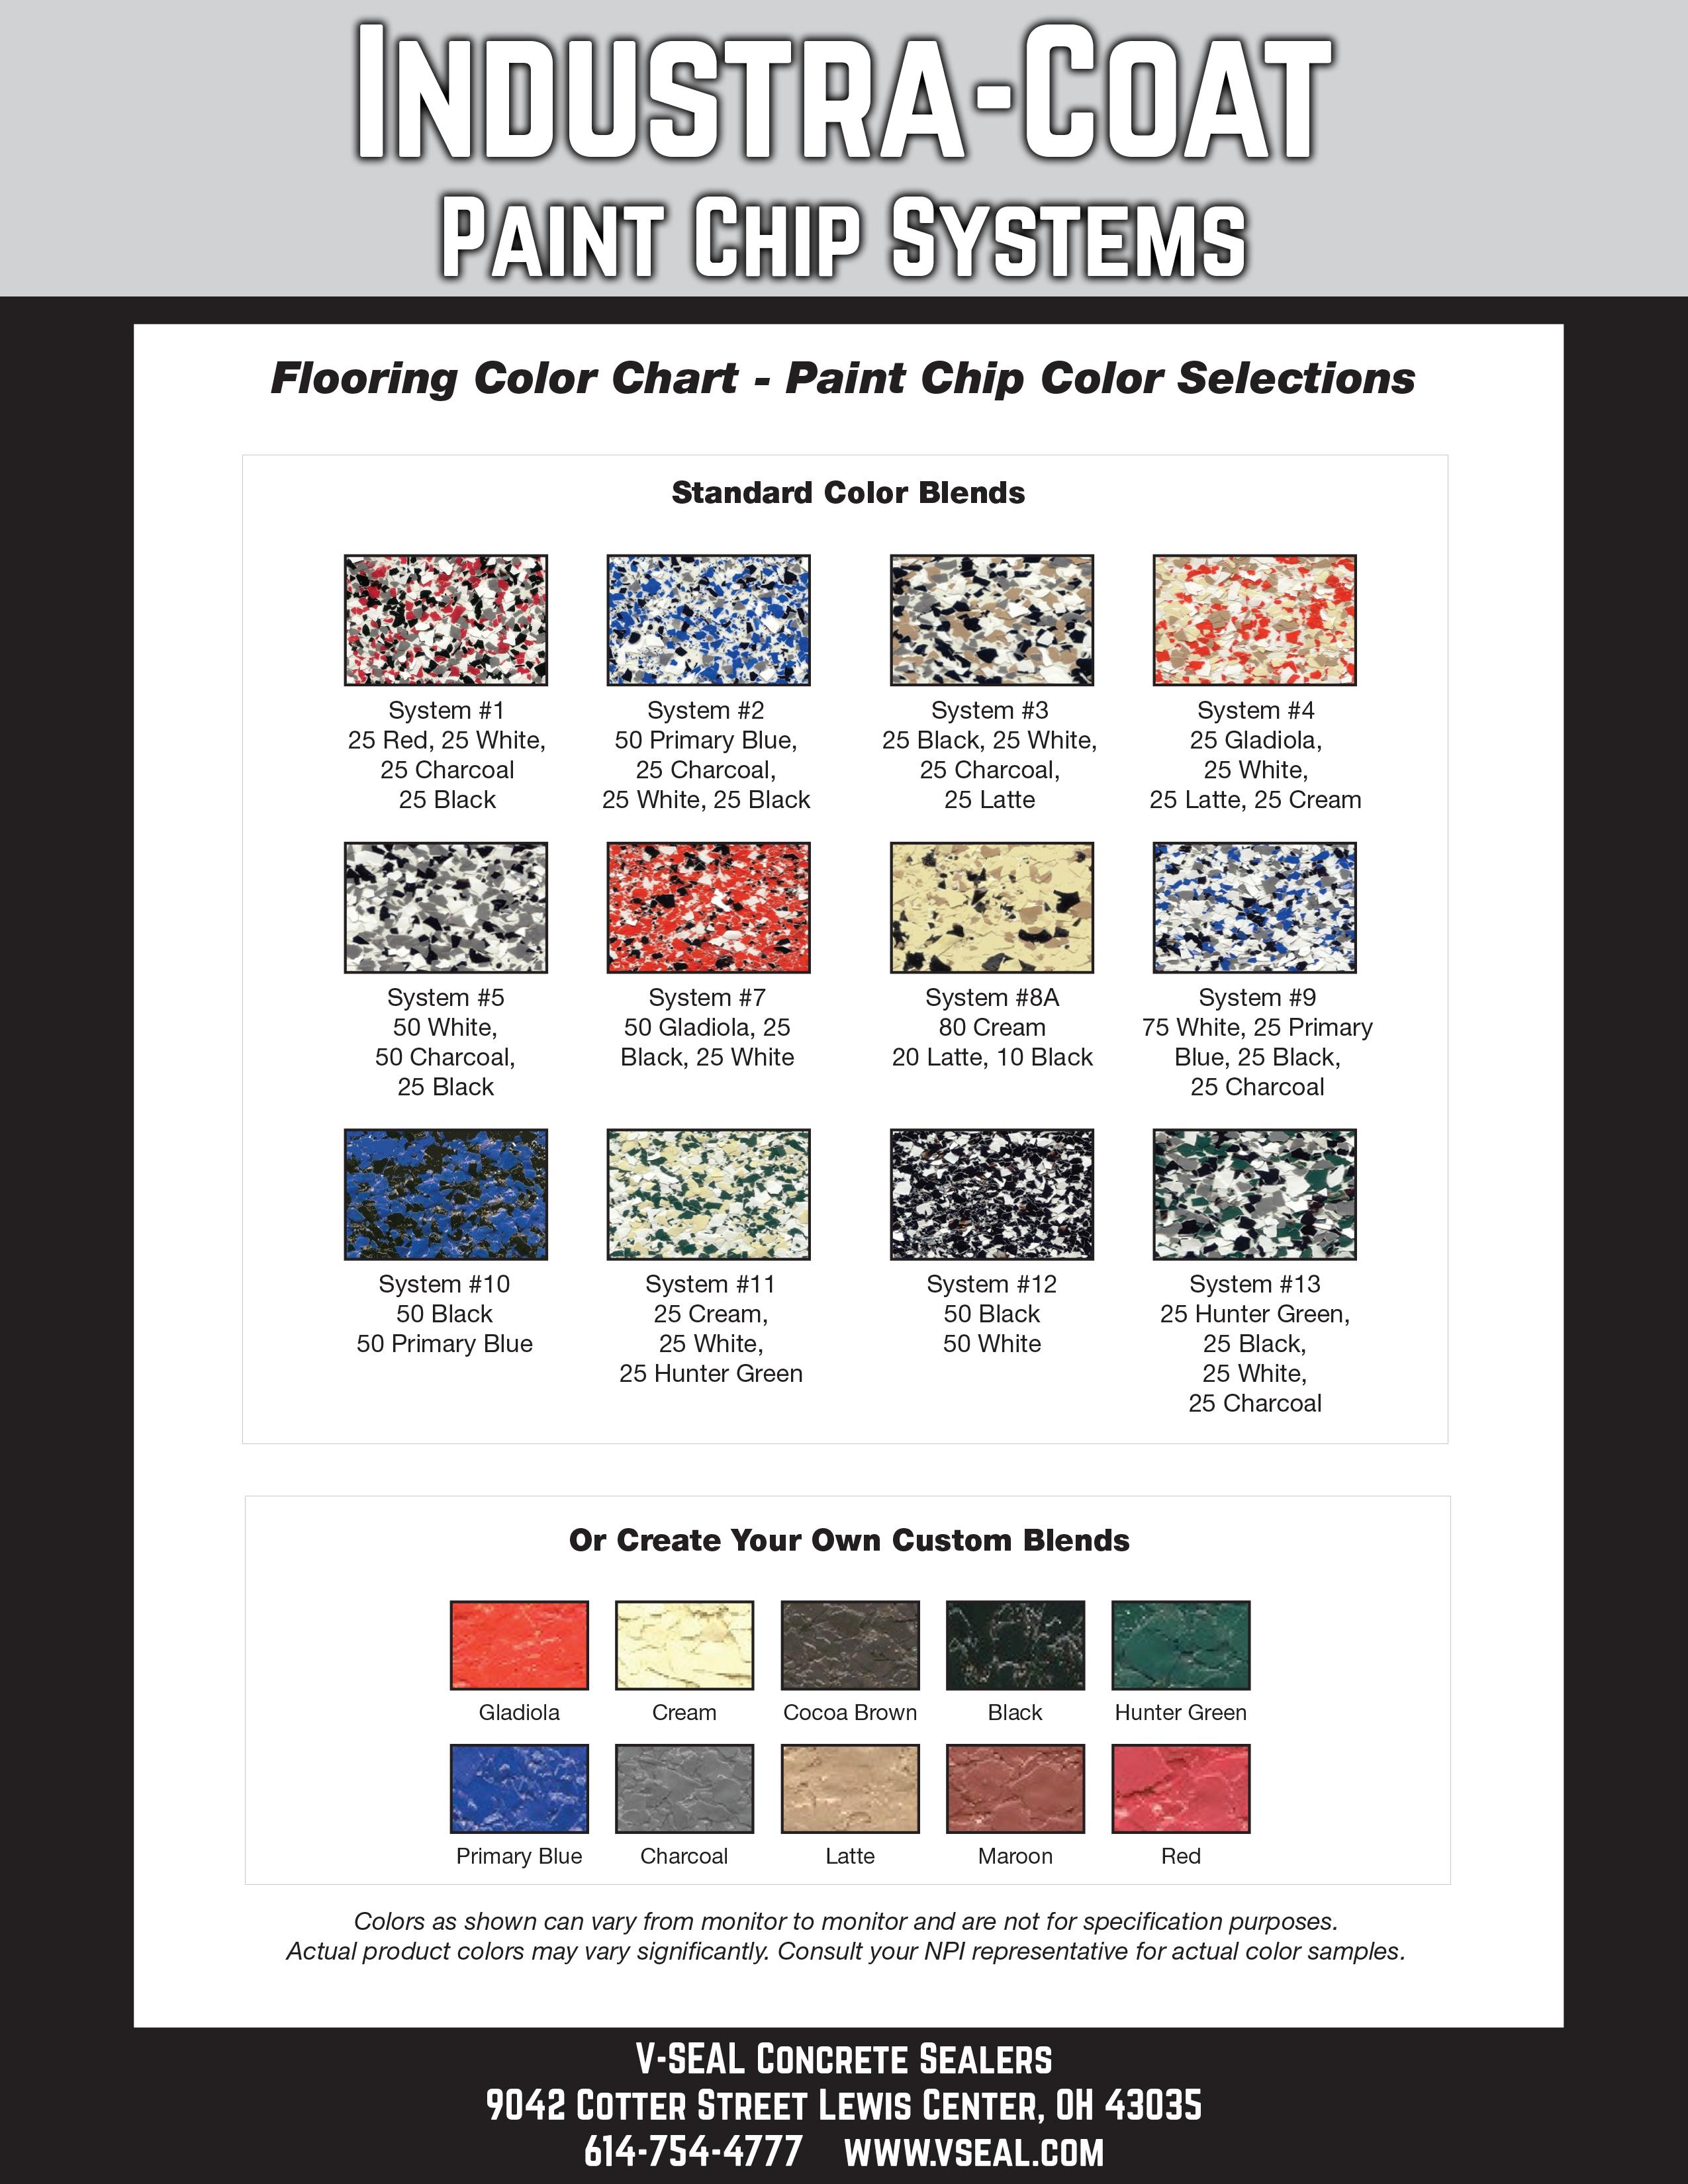 https://www.vseal.com/media/catalog/product/cache/1/image/9df78eab33525d08d6e5fb8d27136e95/i/n/industra-coat_paint_chip_color_chart_3.png